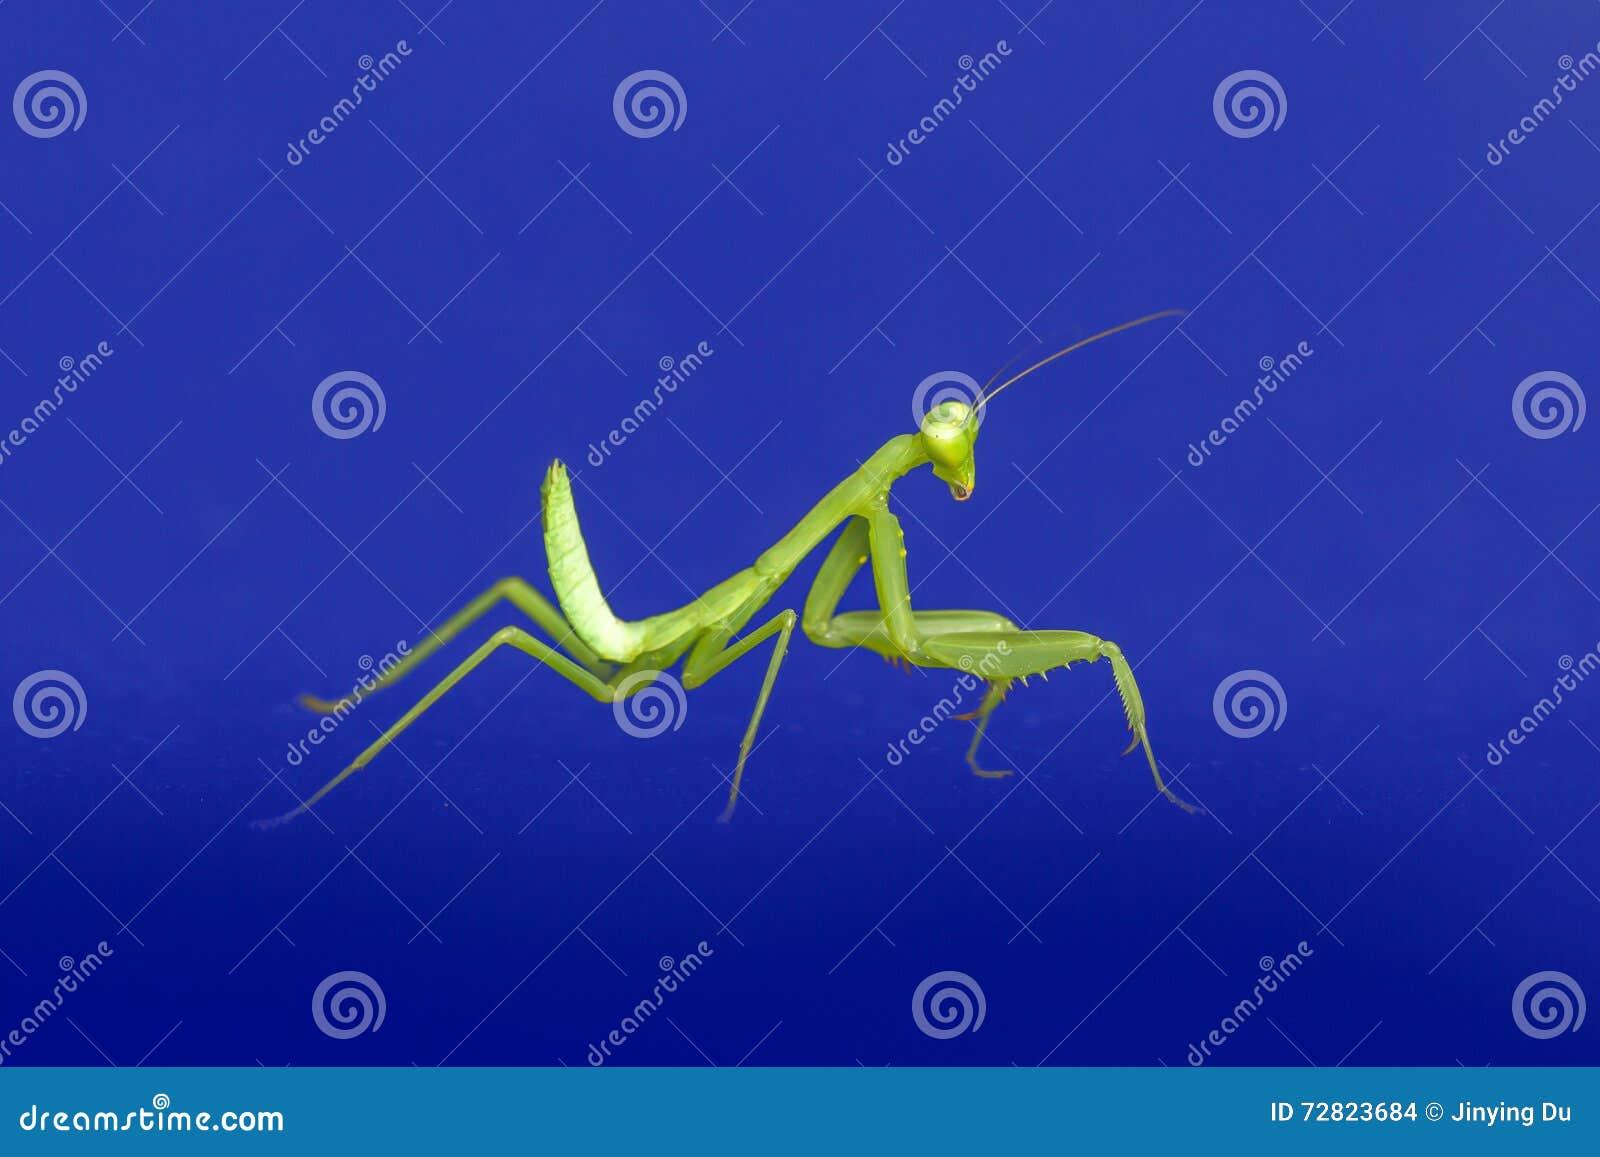 preying mantis isolated on blue background